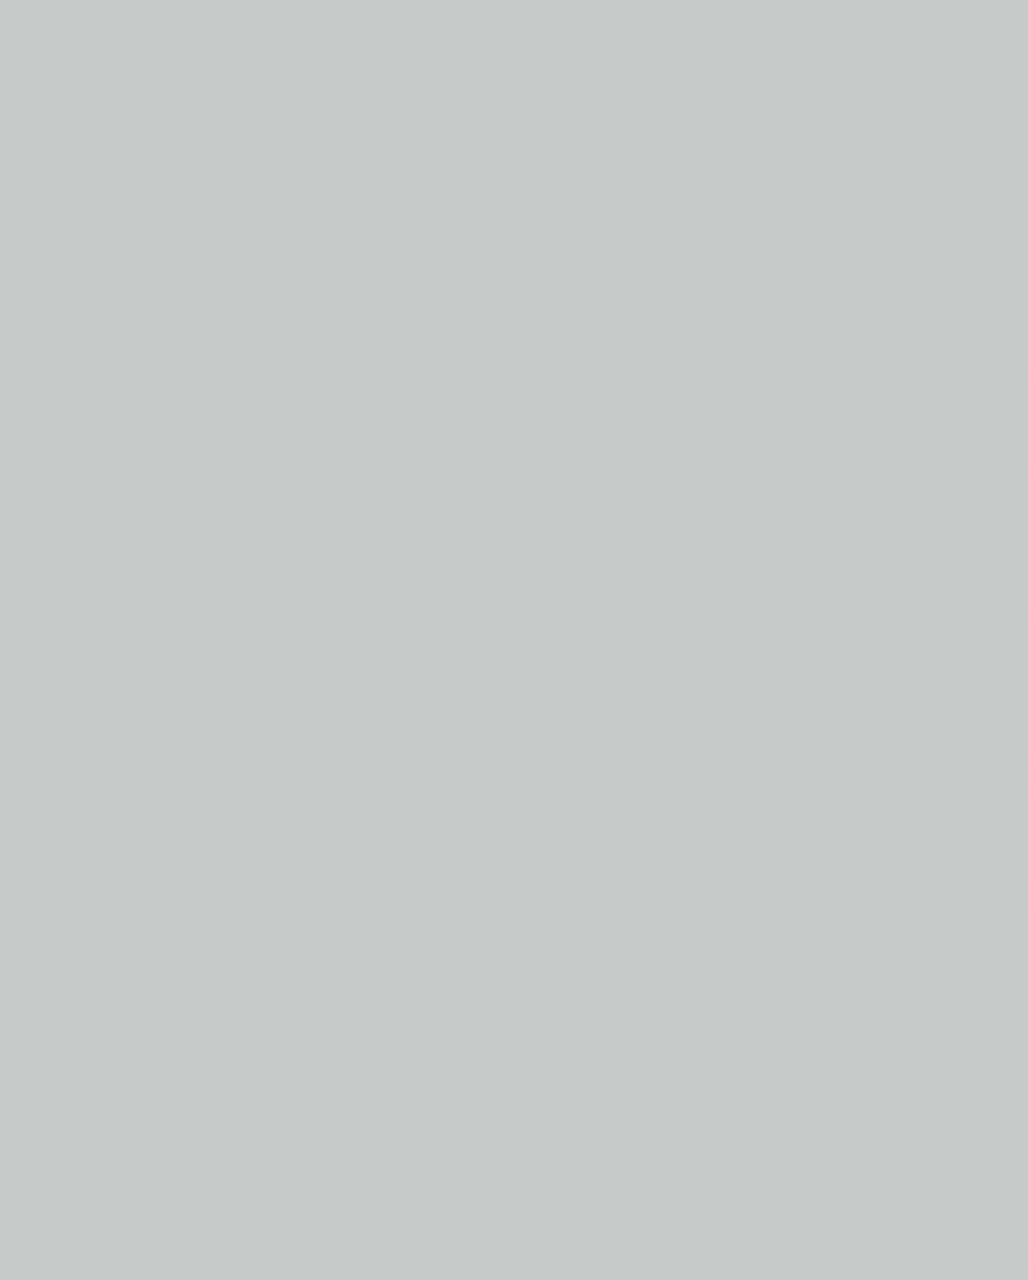 0112 Stone Grey (MF PB sample)